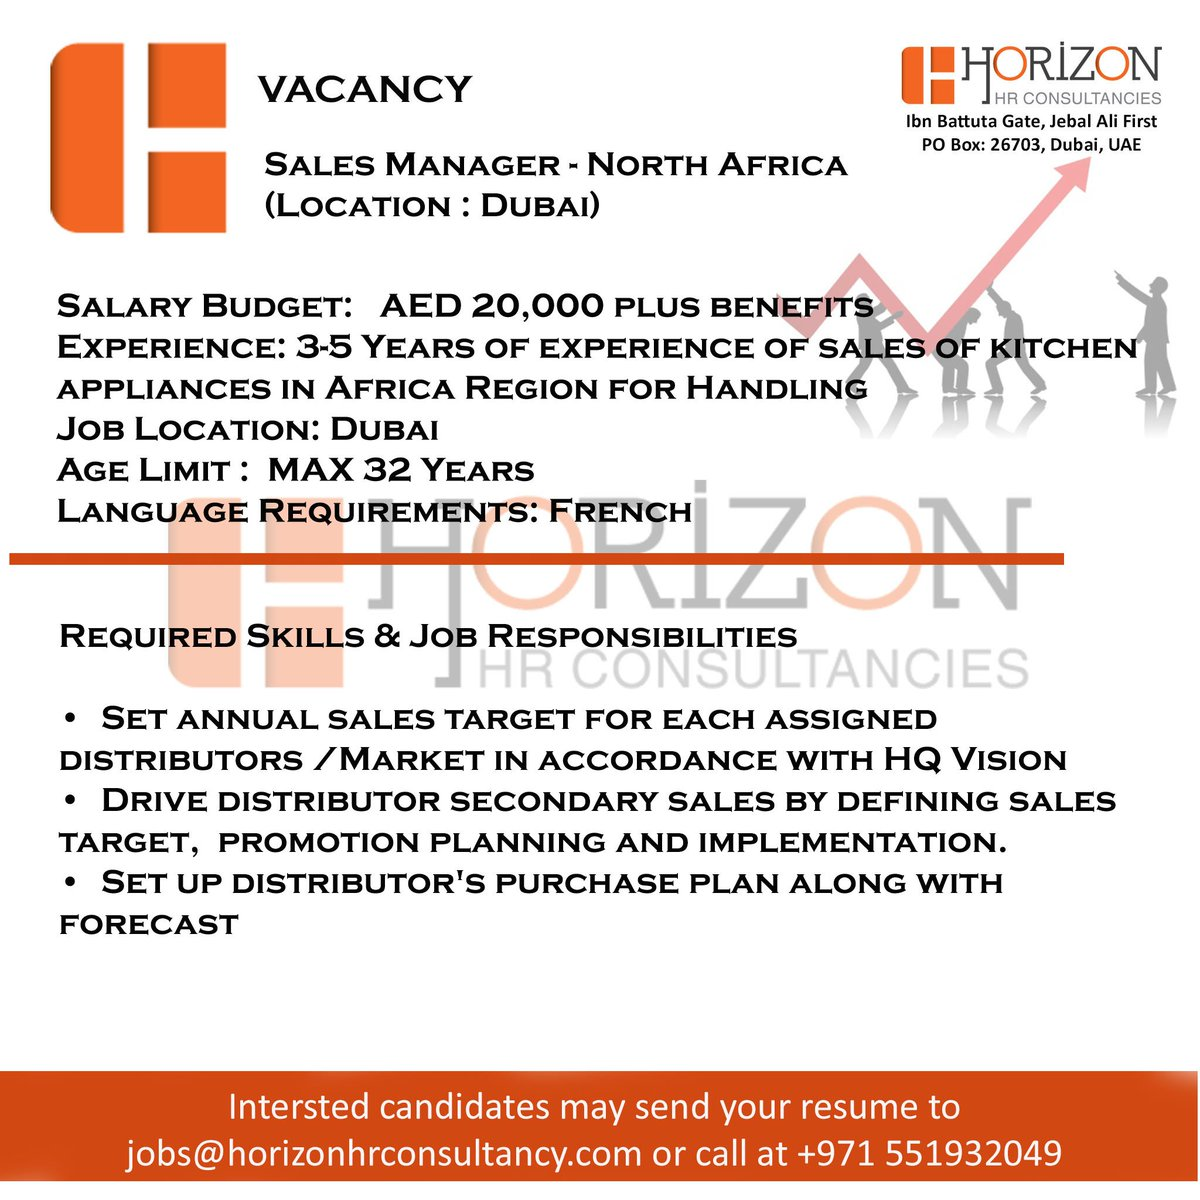 horizon capital hr consultancies horizonadmin twitter